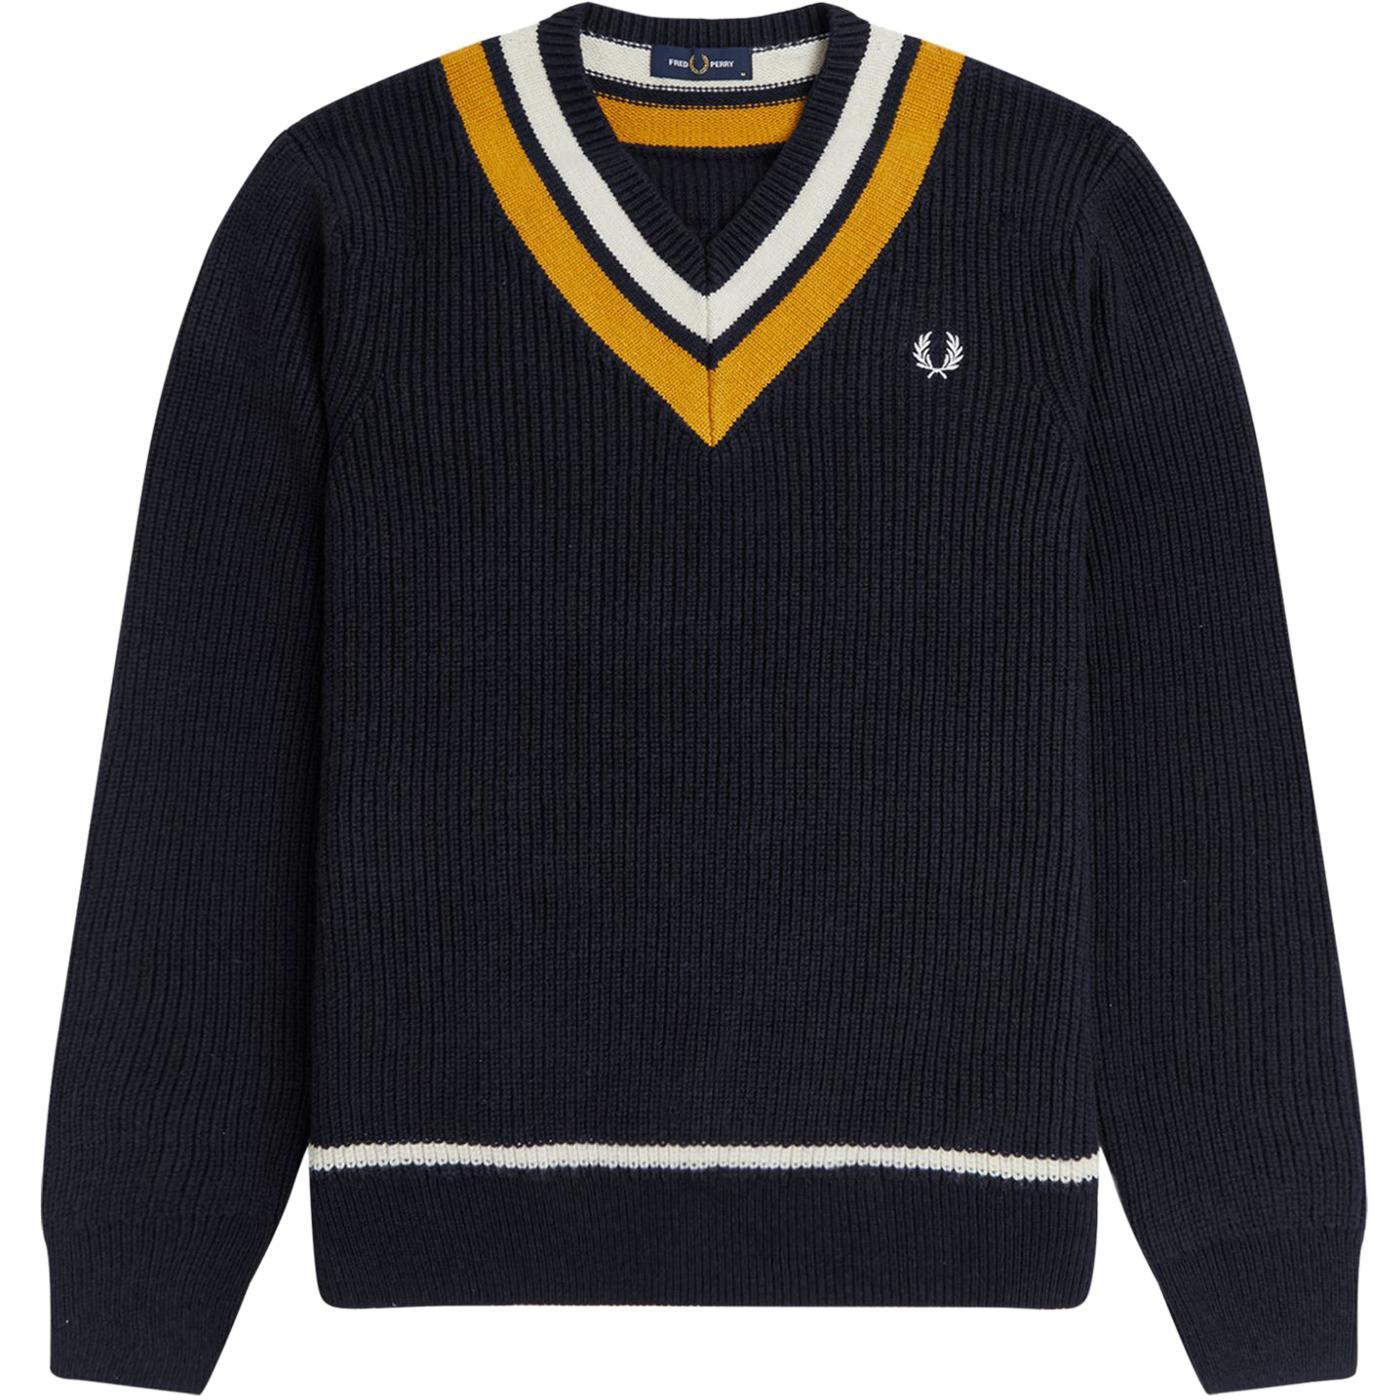 FRED PERRY Retro Stripe Knit V-neck Tennis Jumper